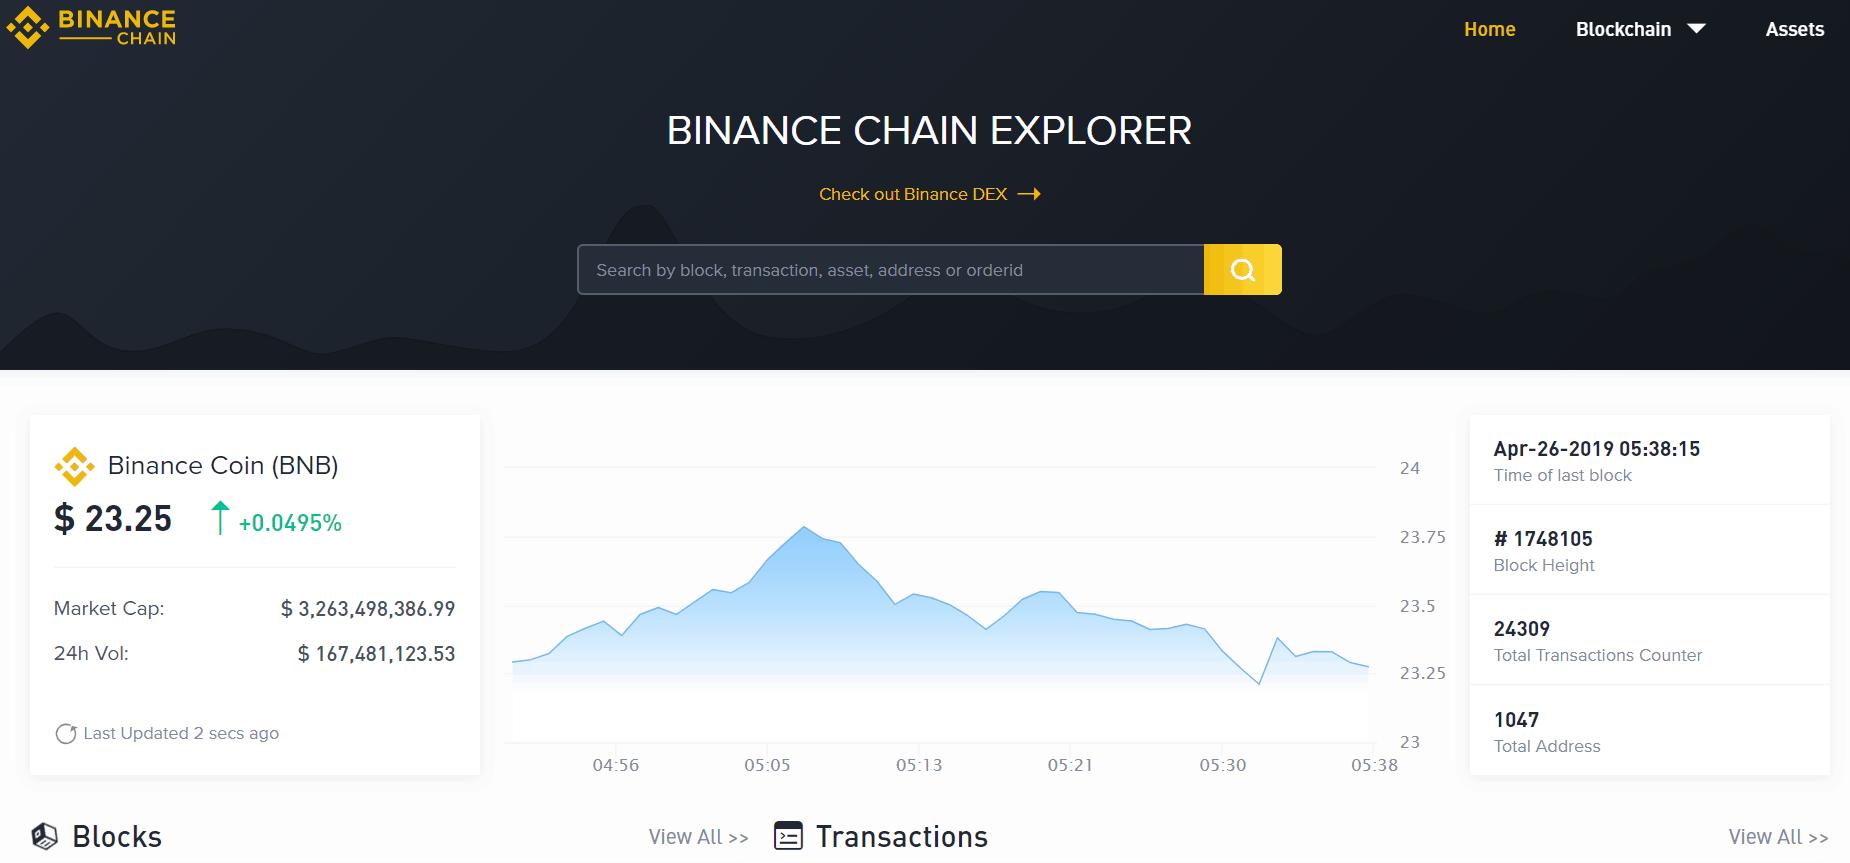 Binance Chain Explorer